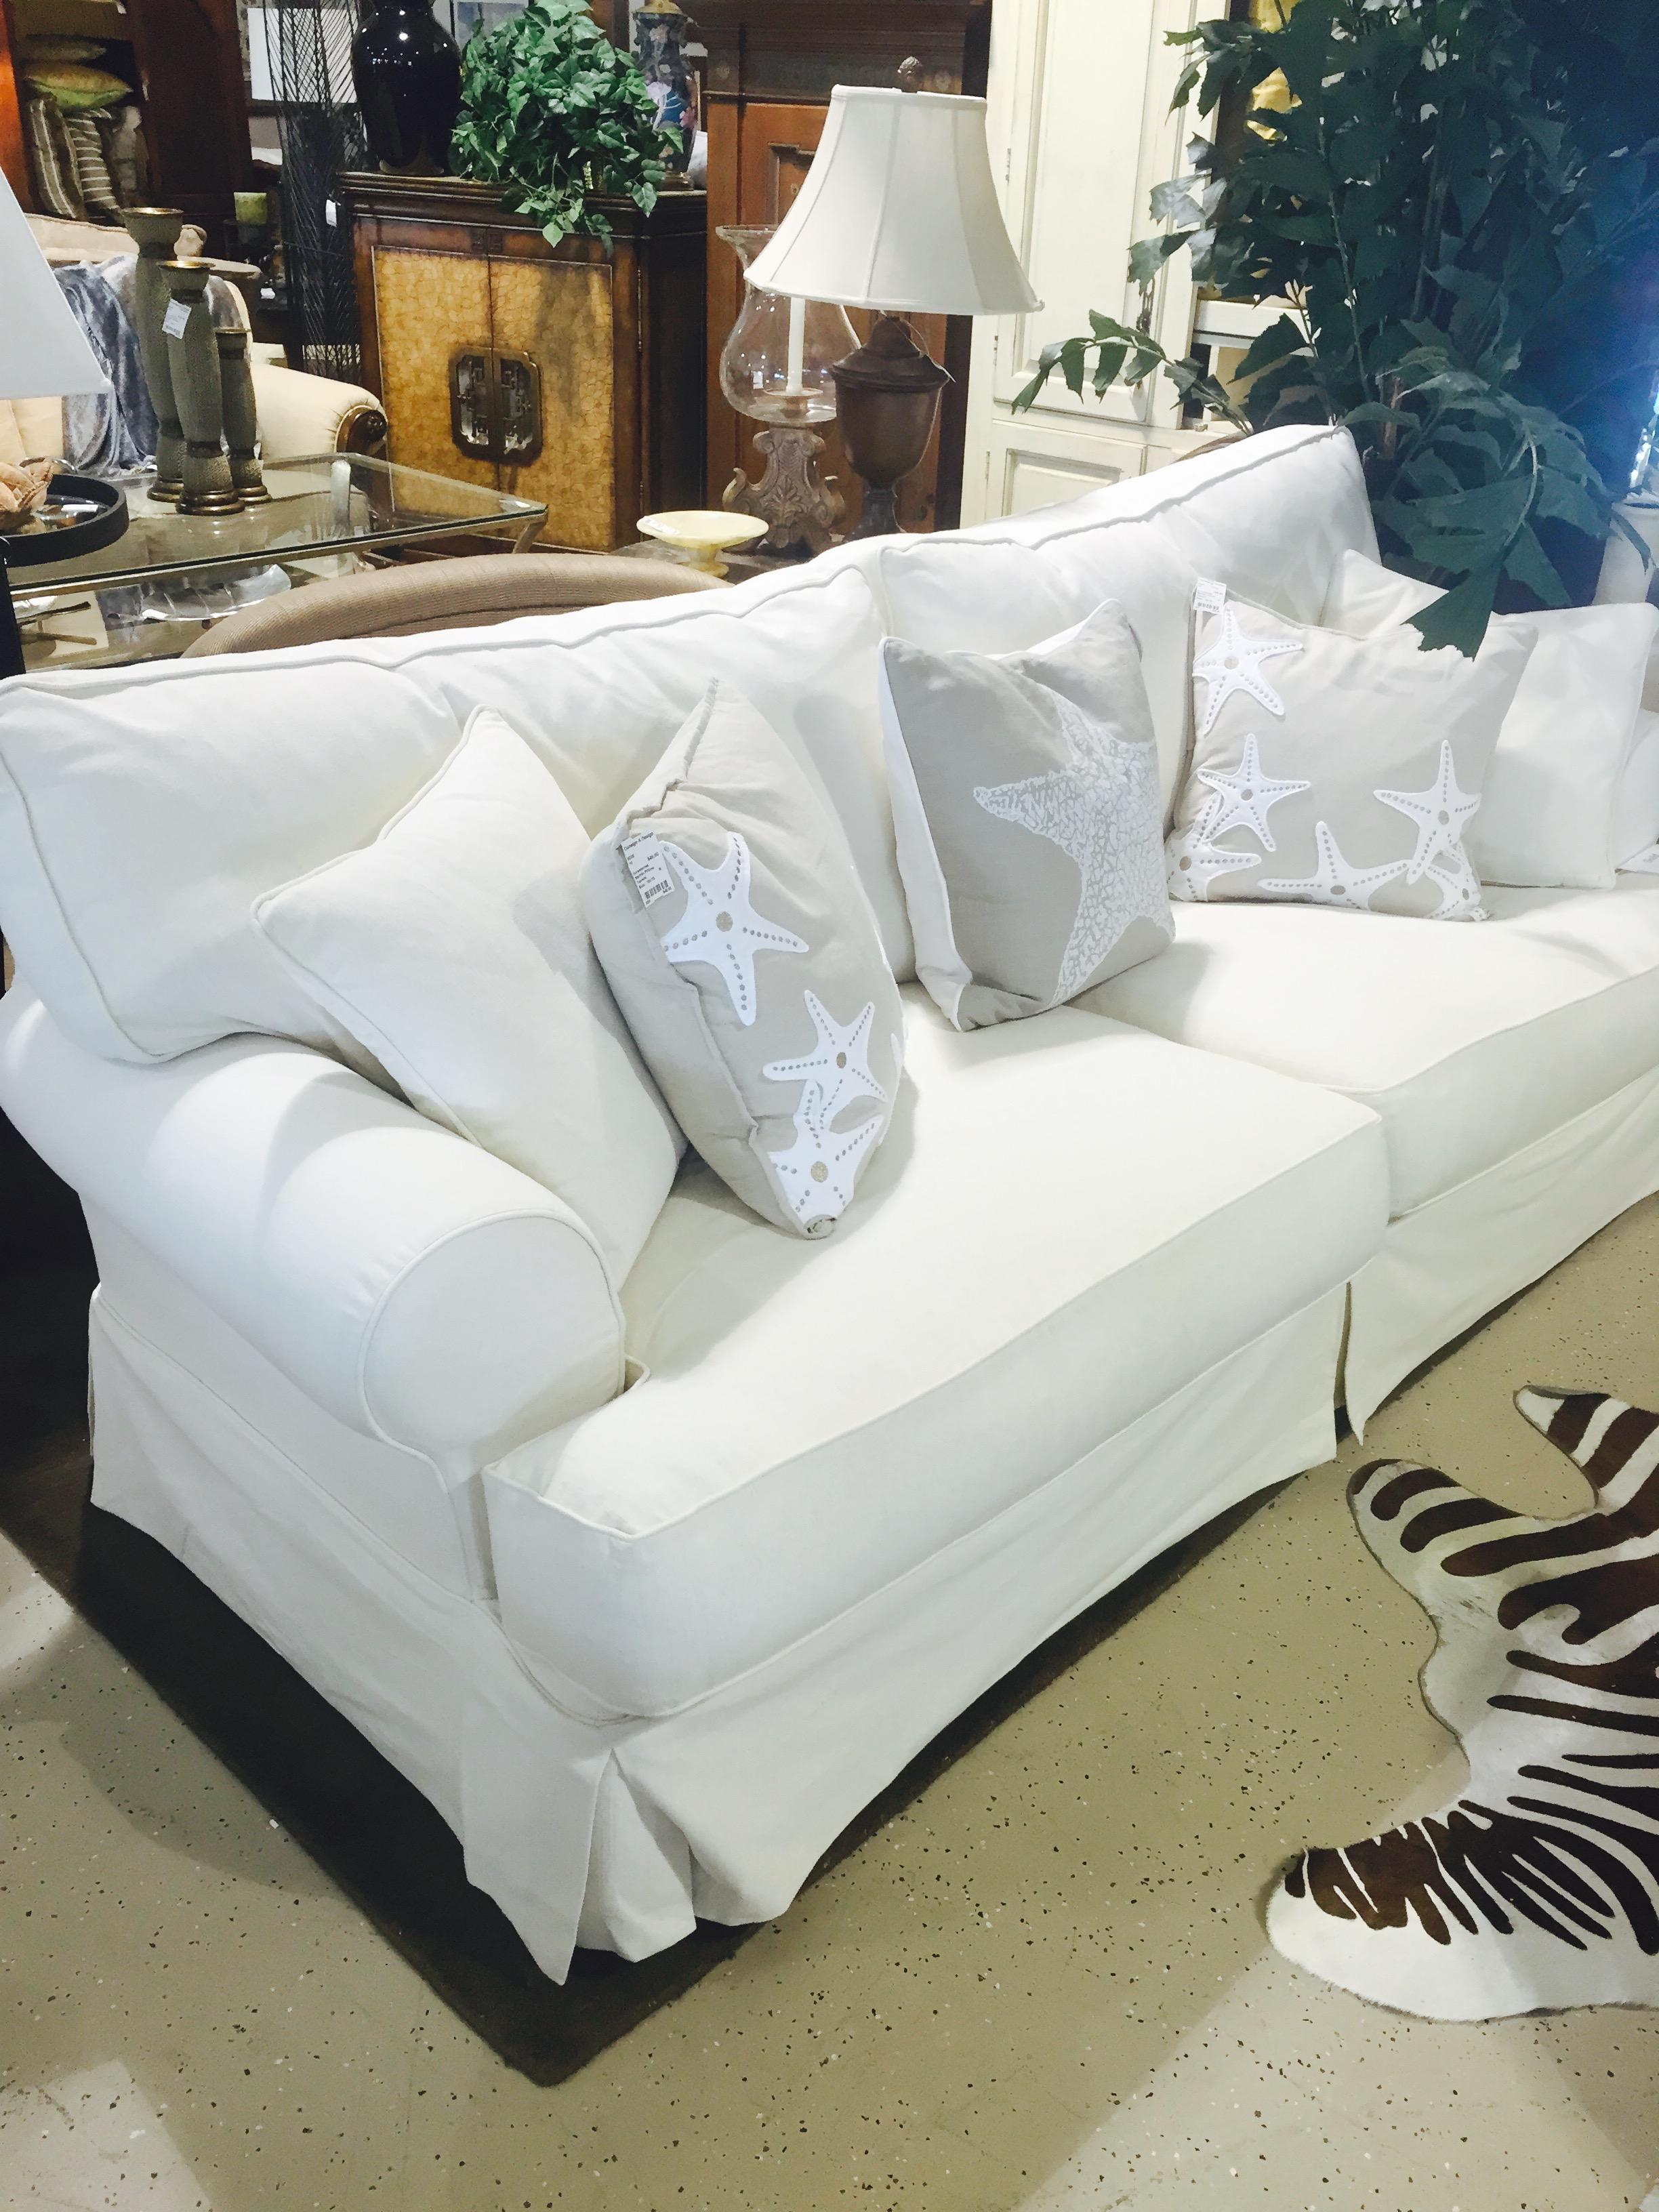 Shabby chic slip Sofa CONSIGN & DESIGN BONITA SPRINGS FL